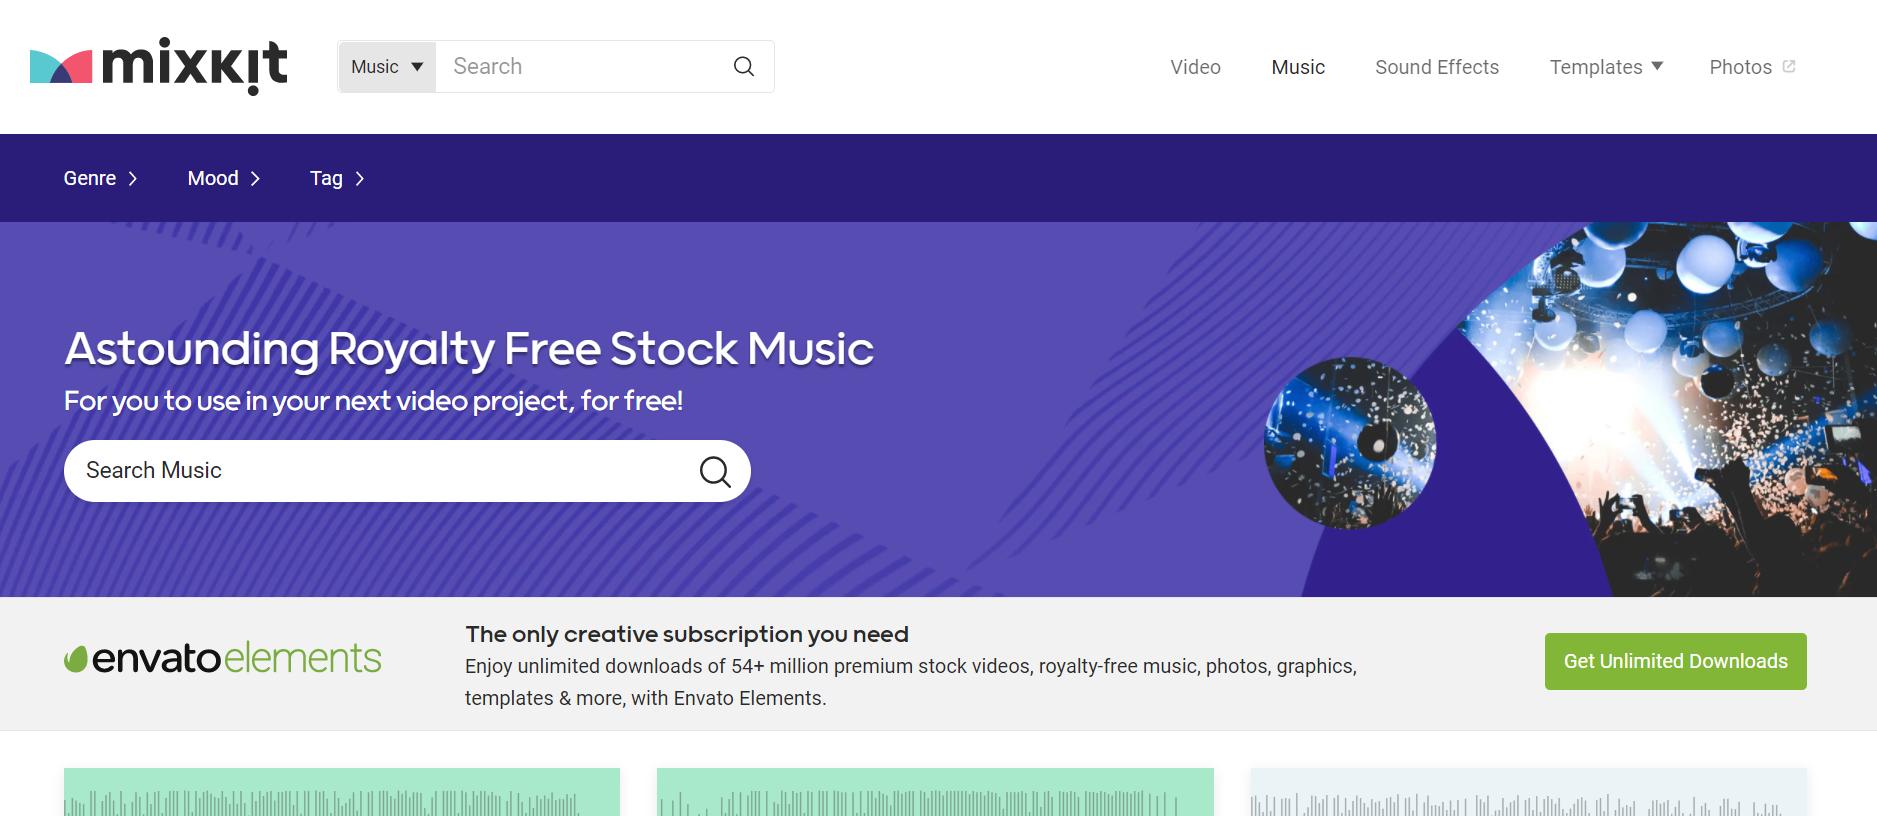 Mixkit Music音乐视频素材下载网站